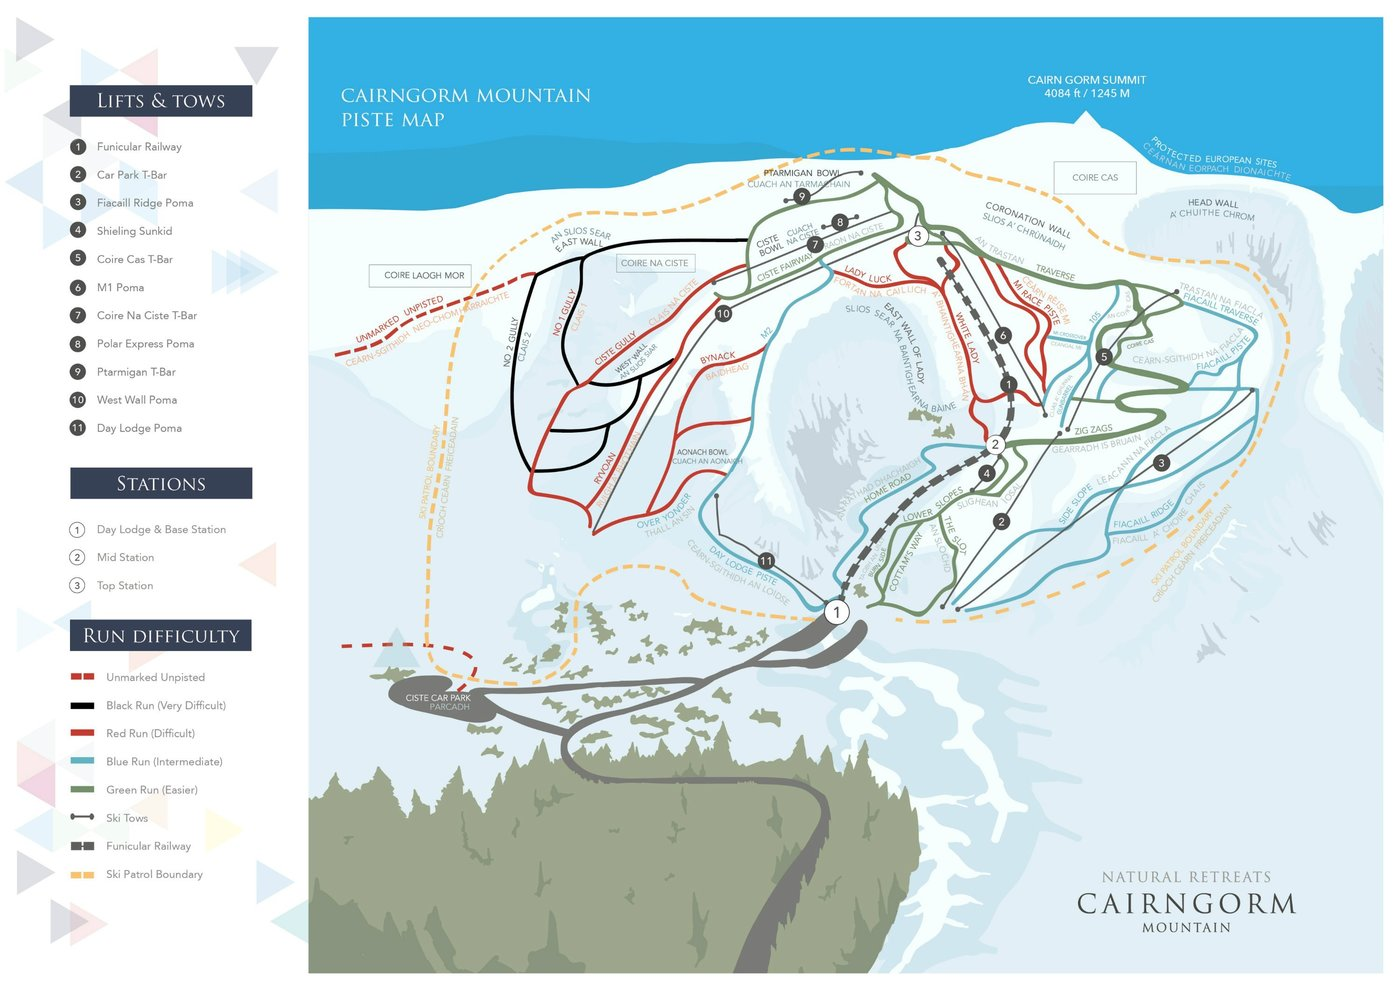 CairnGorm Mountain Trail Map